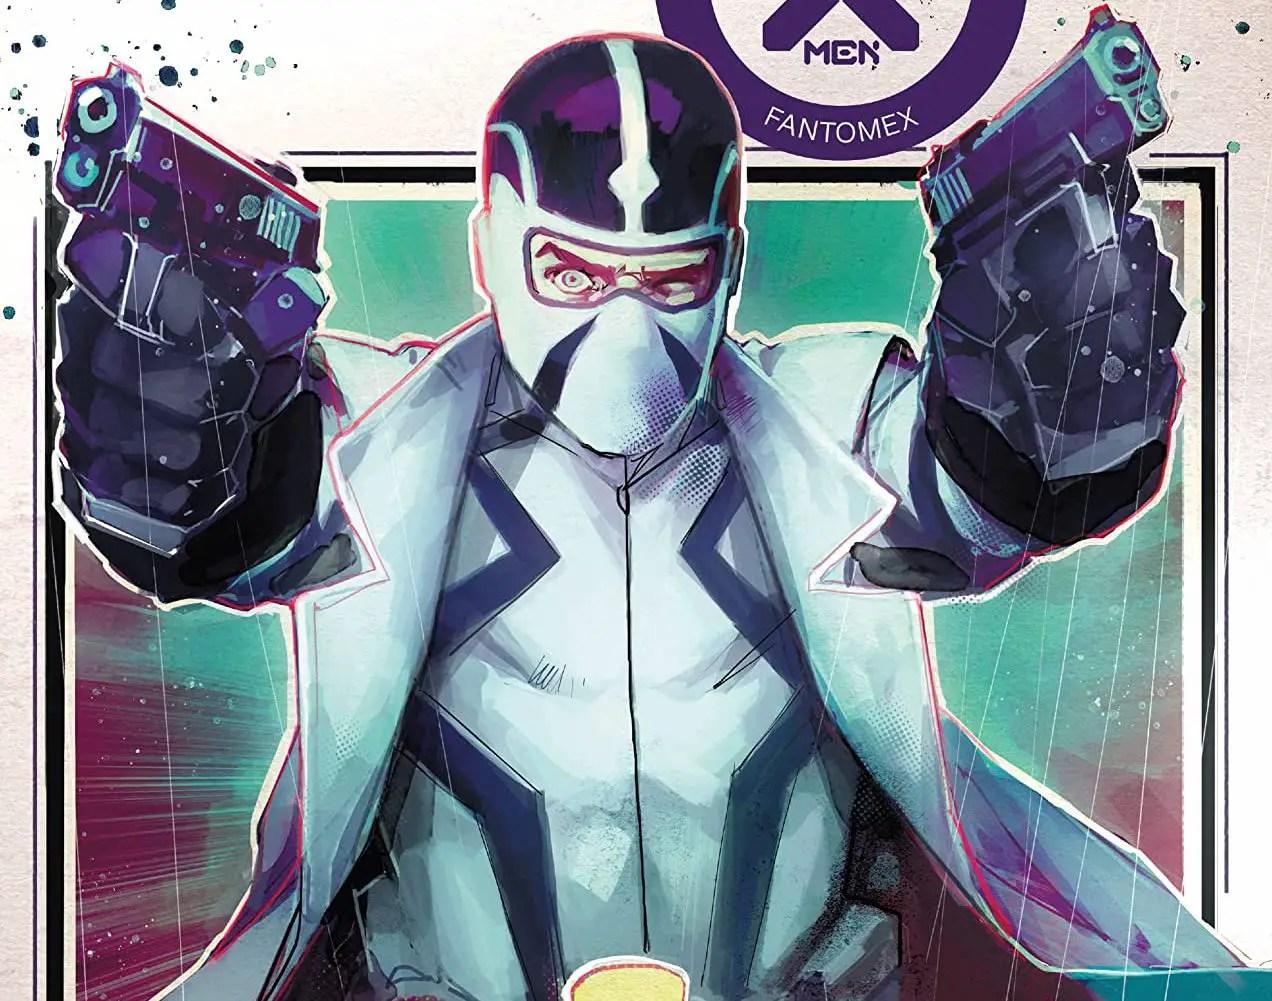 'Giant-Size X-Men: Fantomex' #1 review